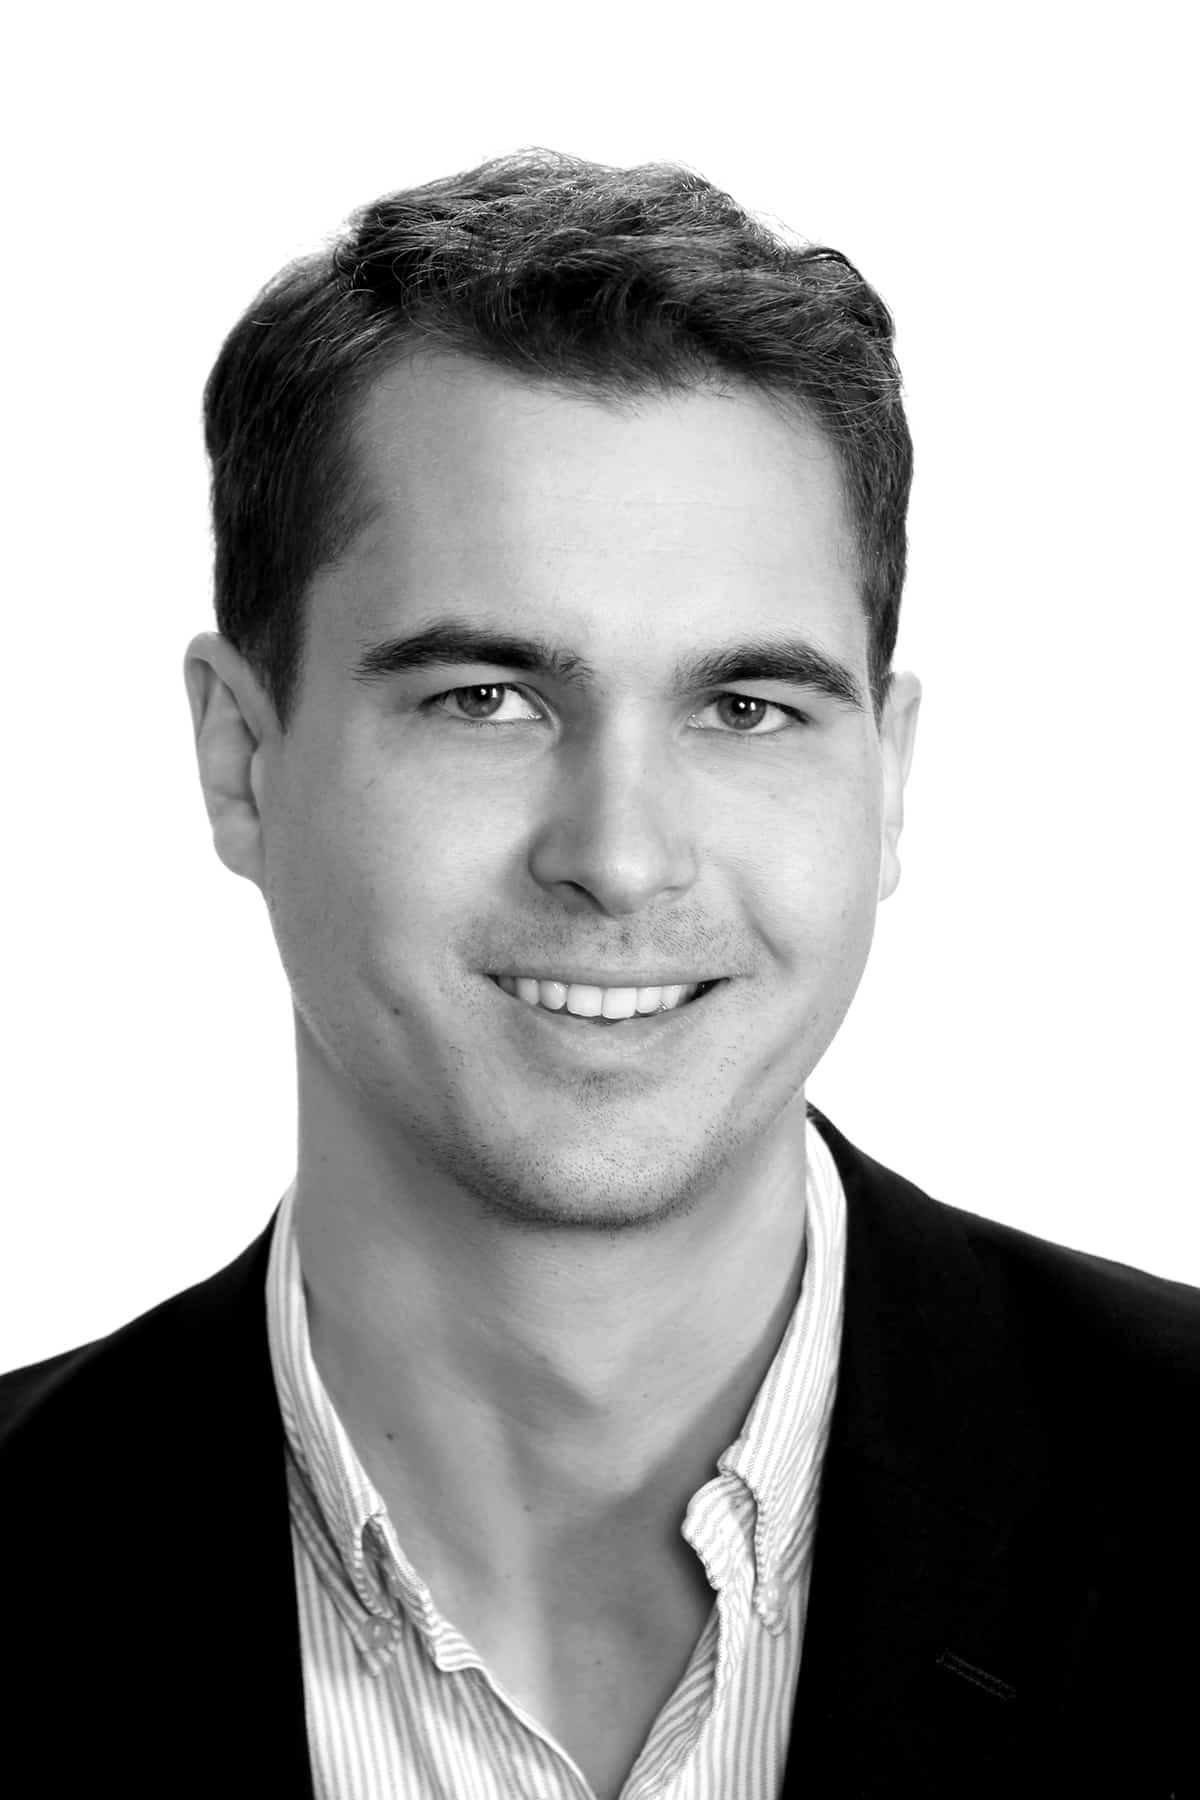 David Mogielnicki